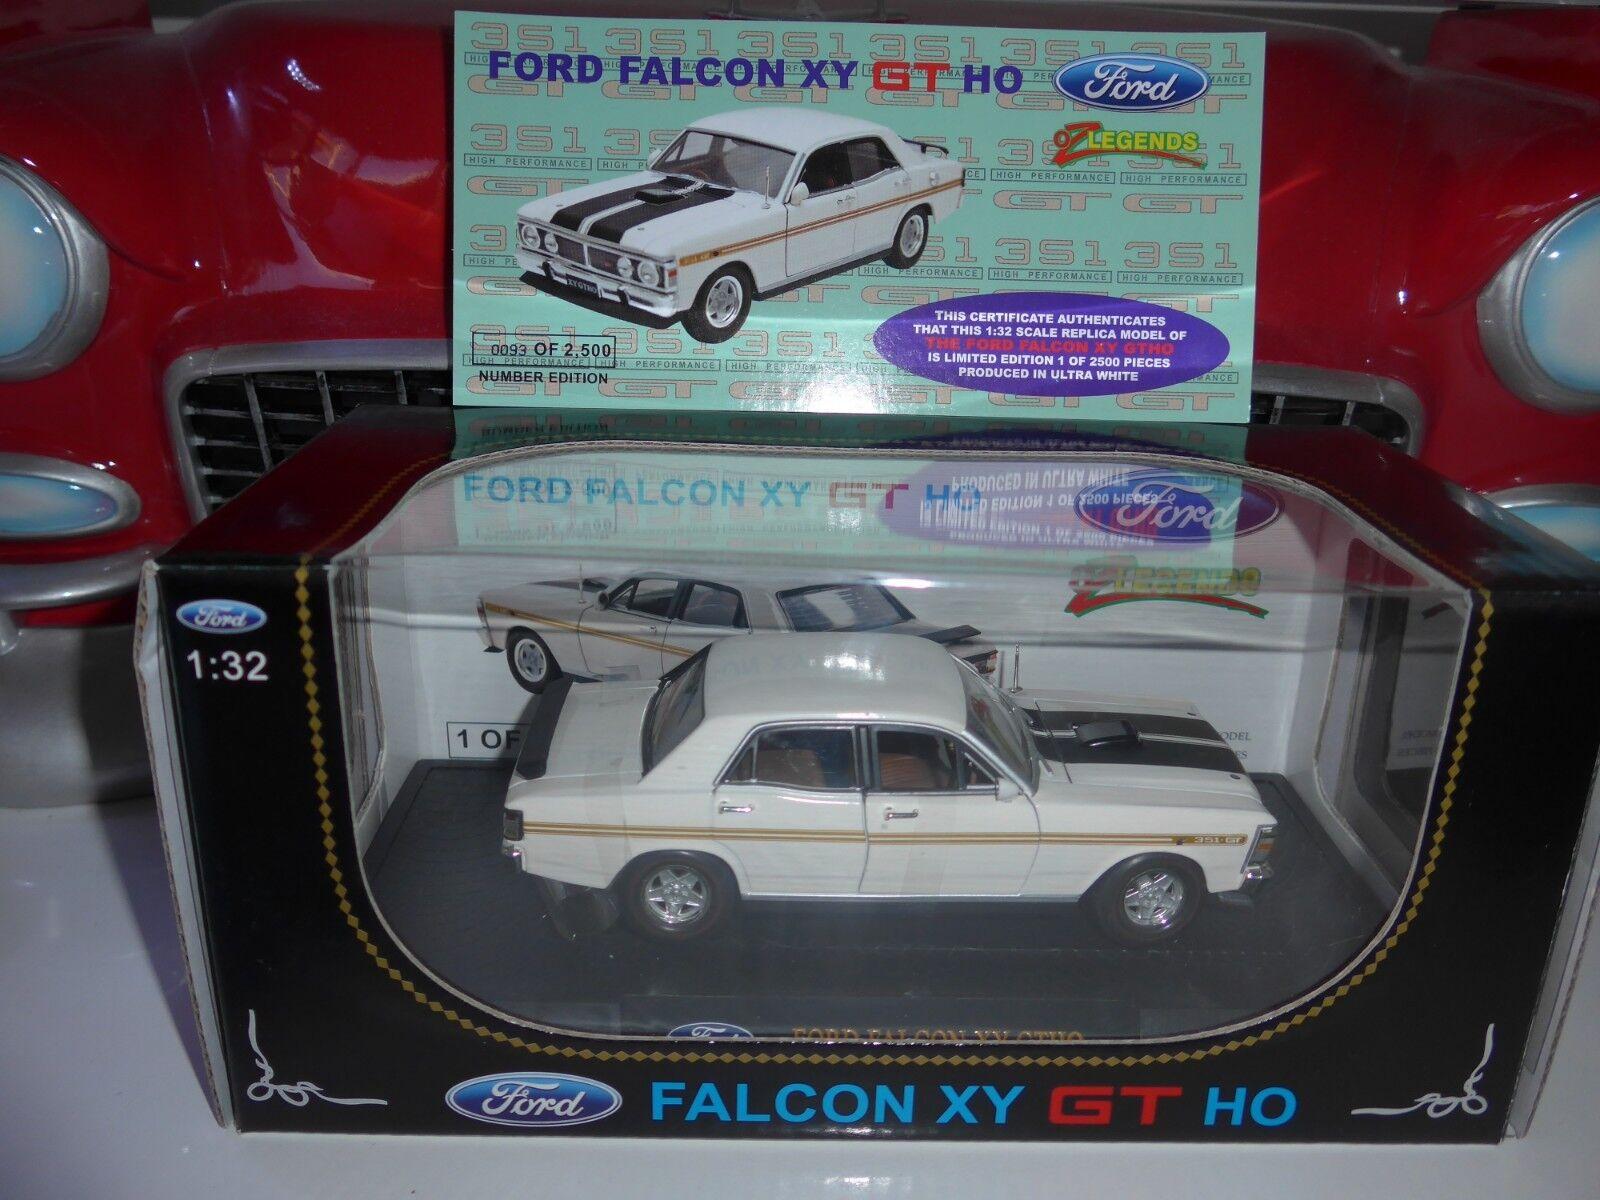 1 32 32 32 scale Ford Falcon XY GTHO w COA   0093 out of 2500 +Bonus 1 24 display case 625e2b